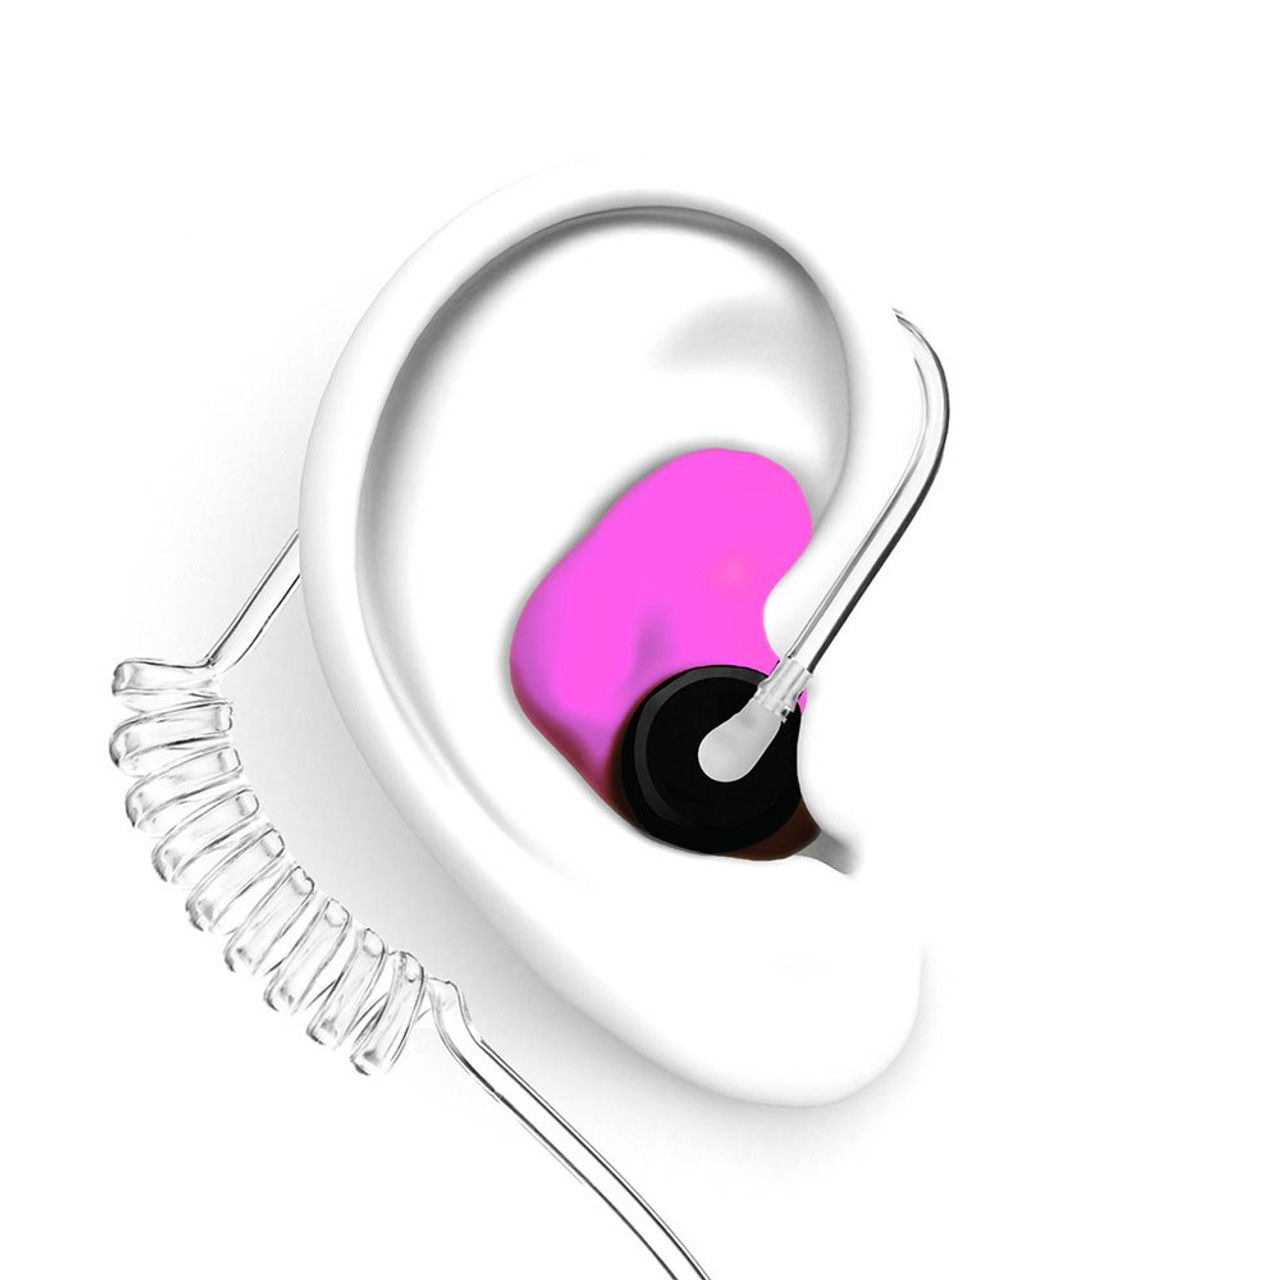 DECIBULLZ Pink Two Way Radio Headset Ear Plug